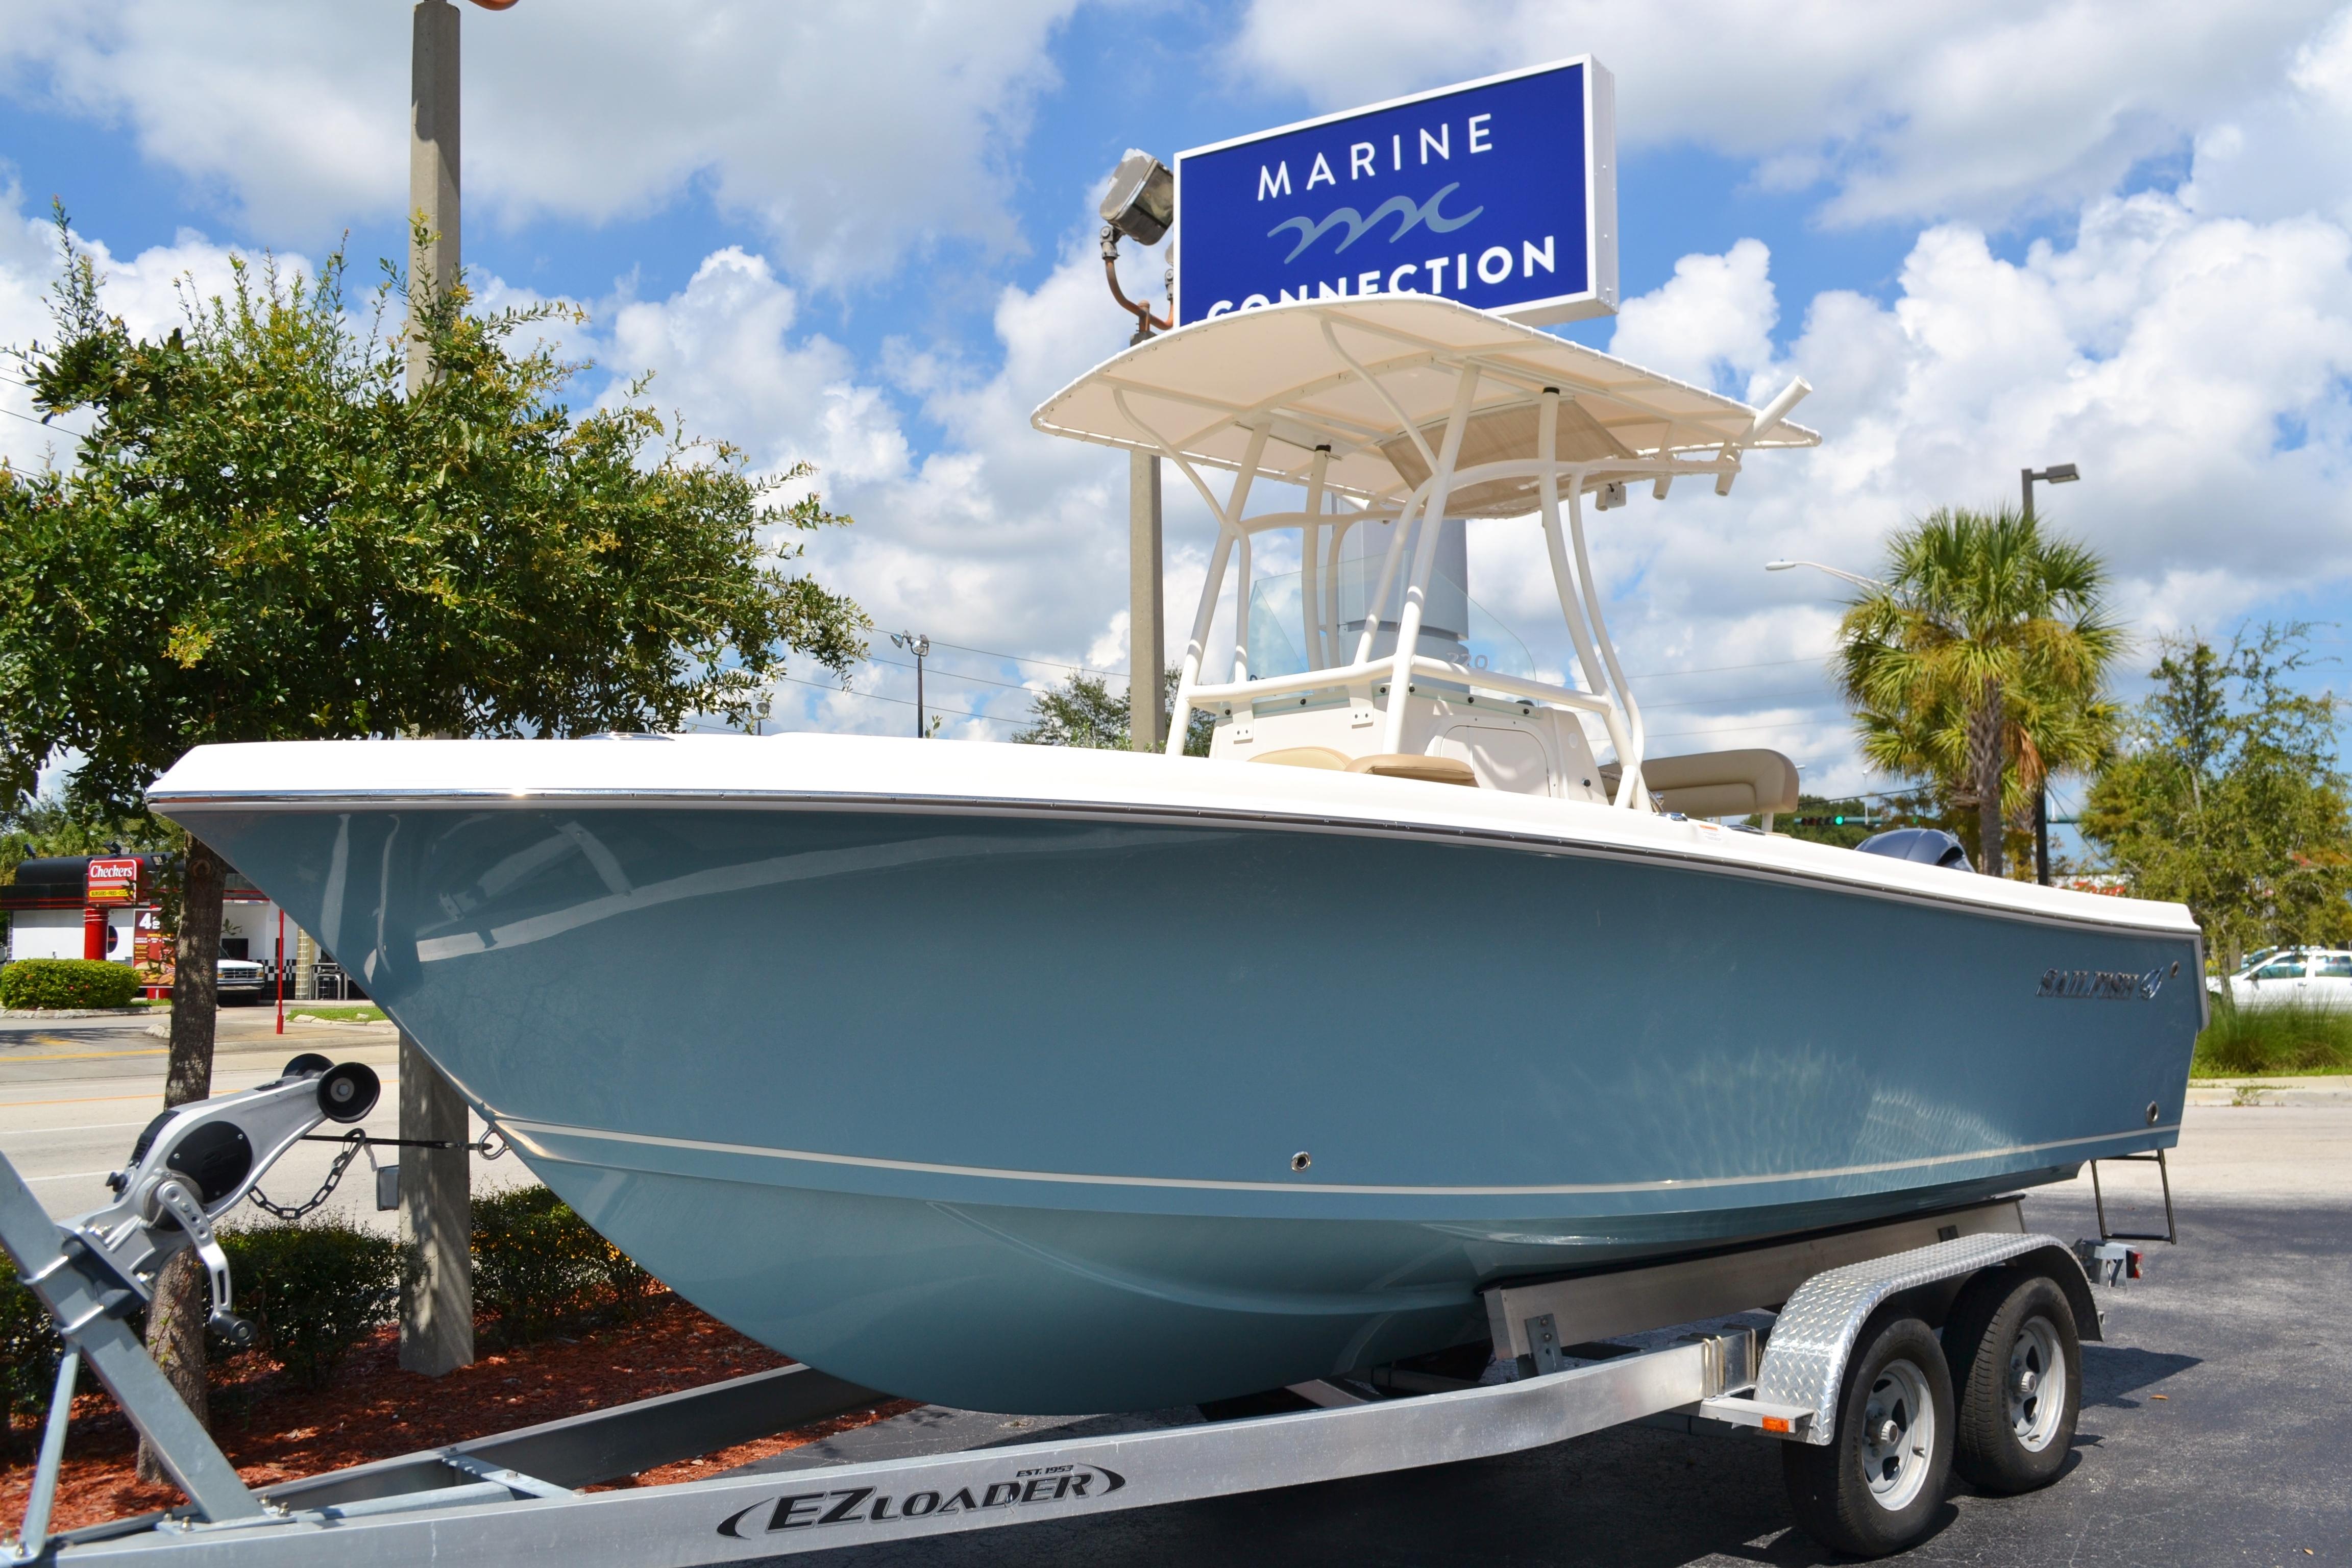 Thumbnail 1 for New 2017 Sailfish 220 CC Center Console boat for sale in Vero Beach, FL